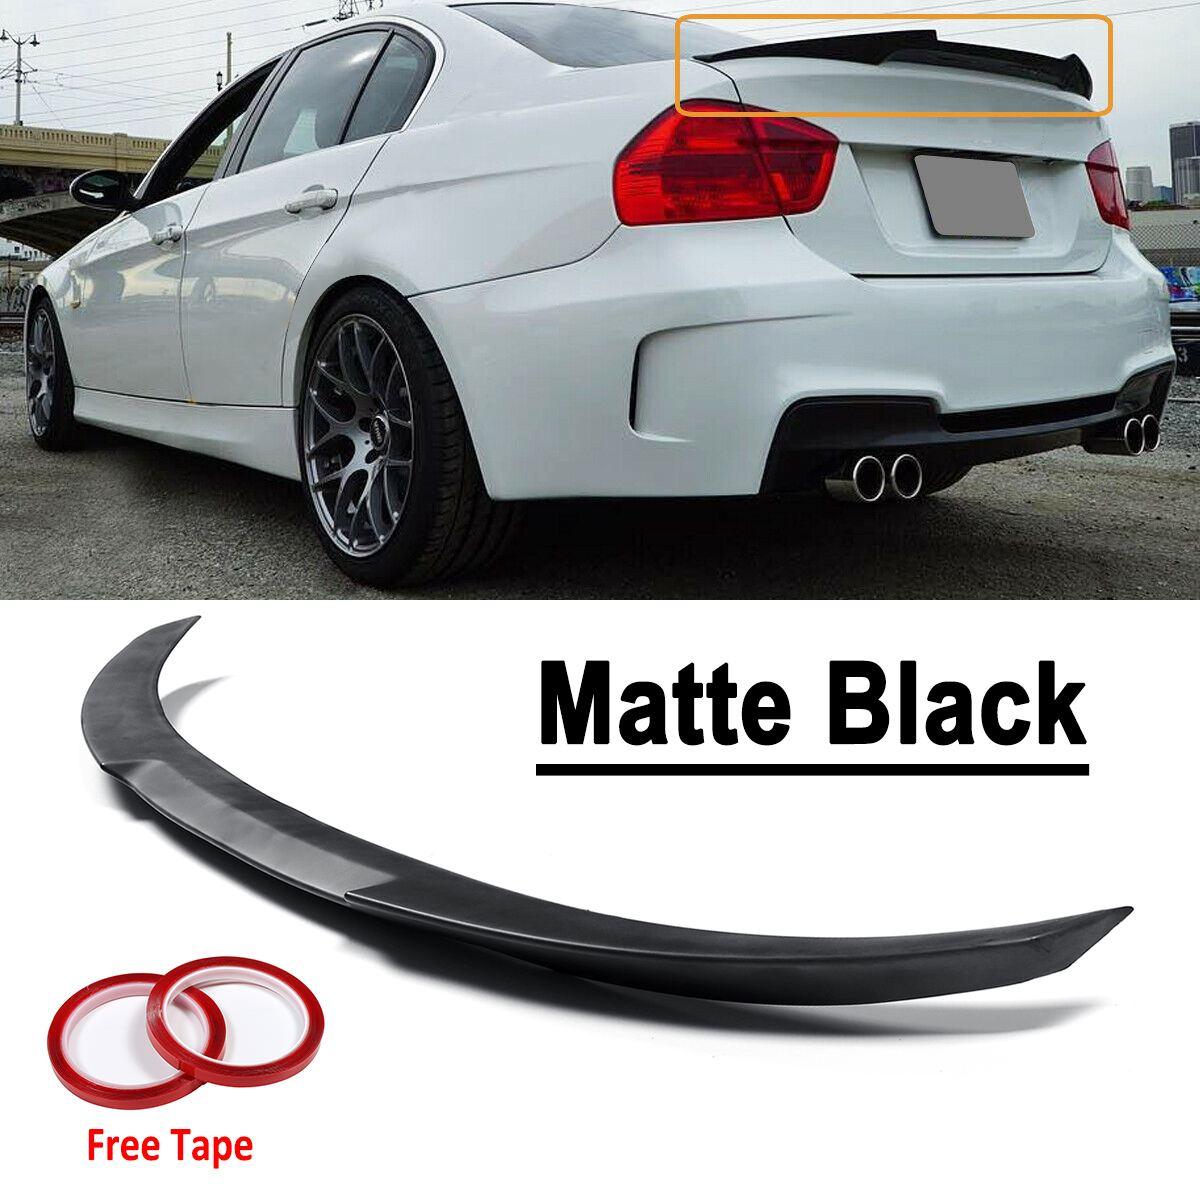 Matte Black ABS Trunk Spoiler Wing M4-Style For BMW 2006-2011 E90 3 SERIES 4 DOOR SEDAN For BMW 2008-12 M3 Sedan